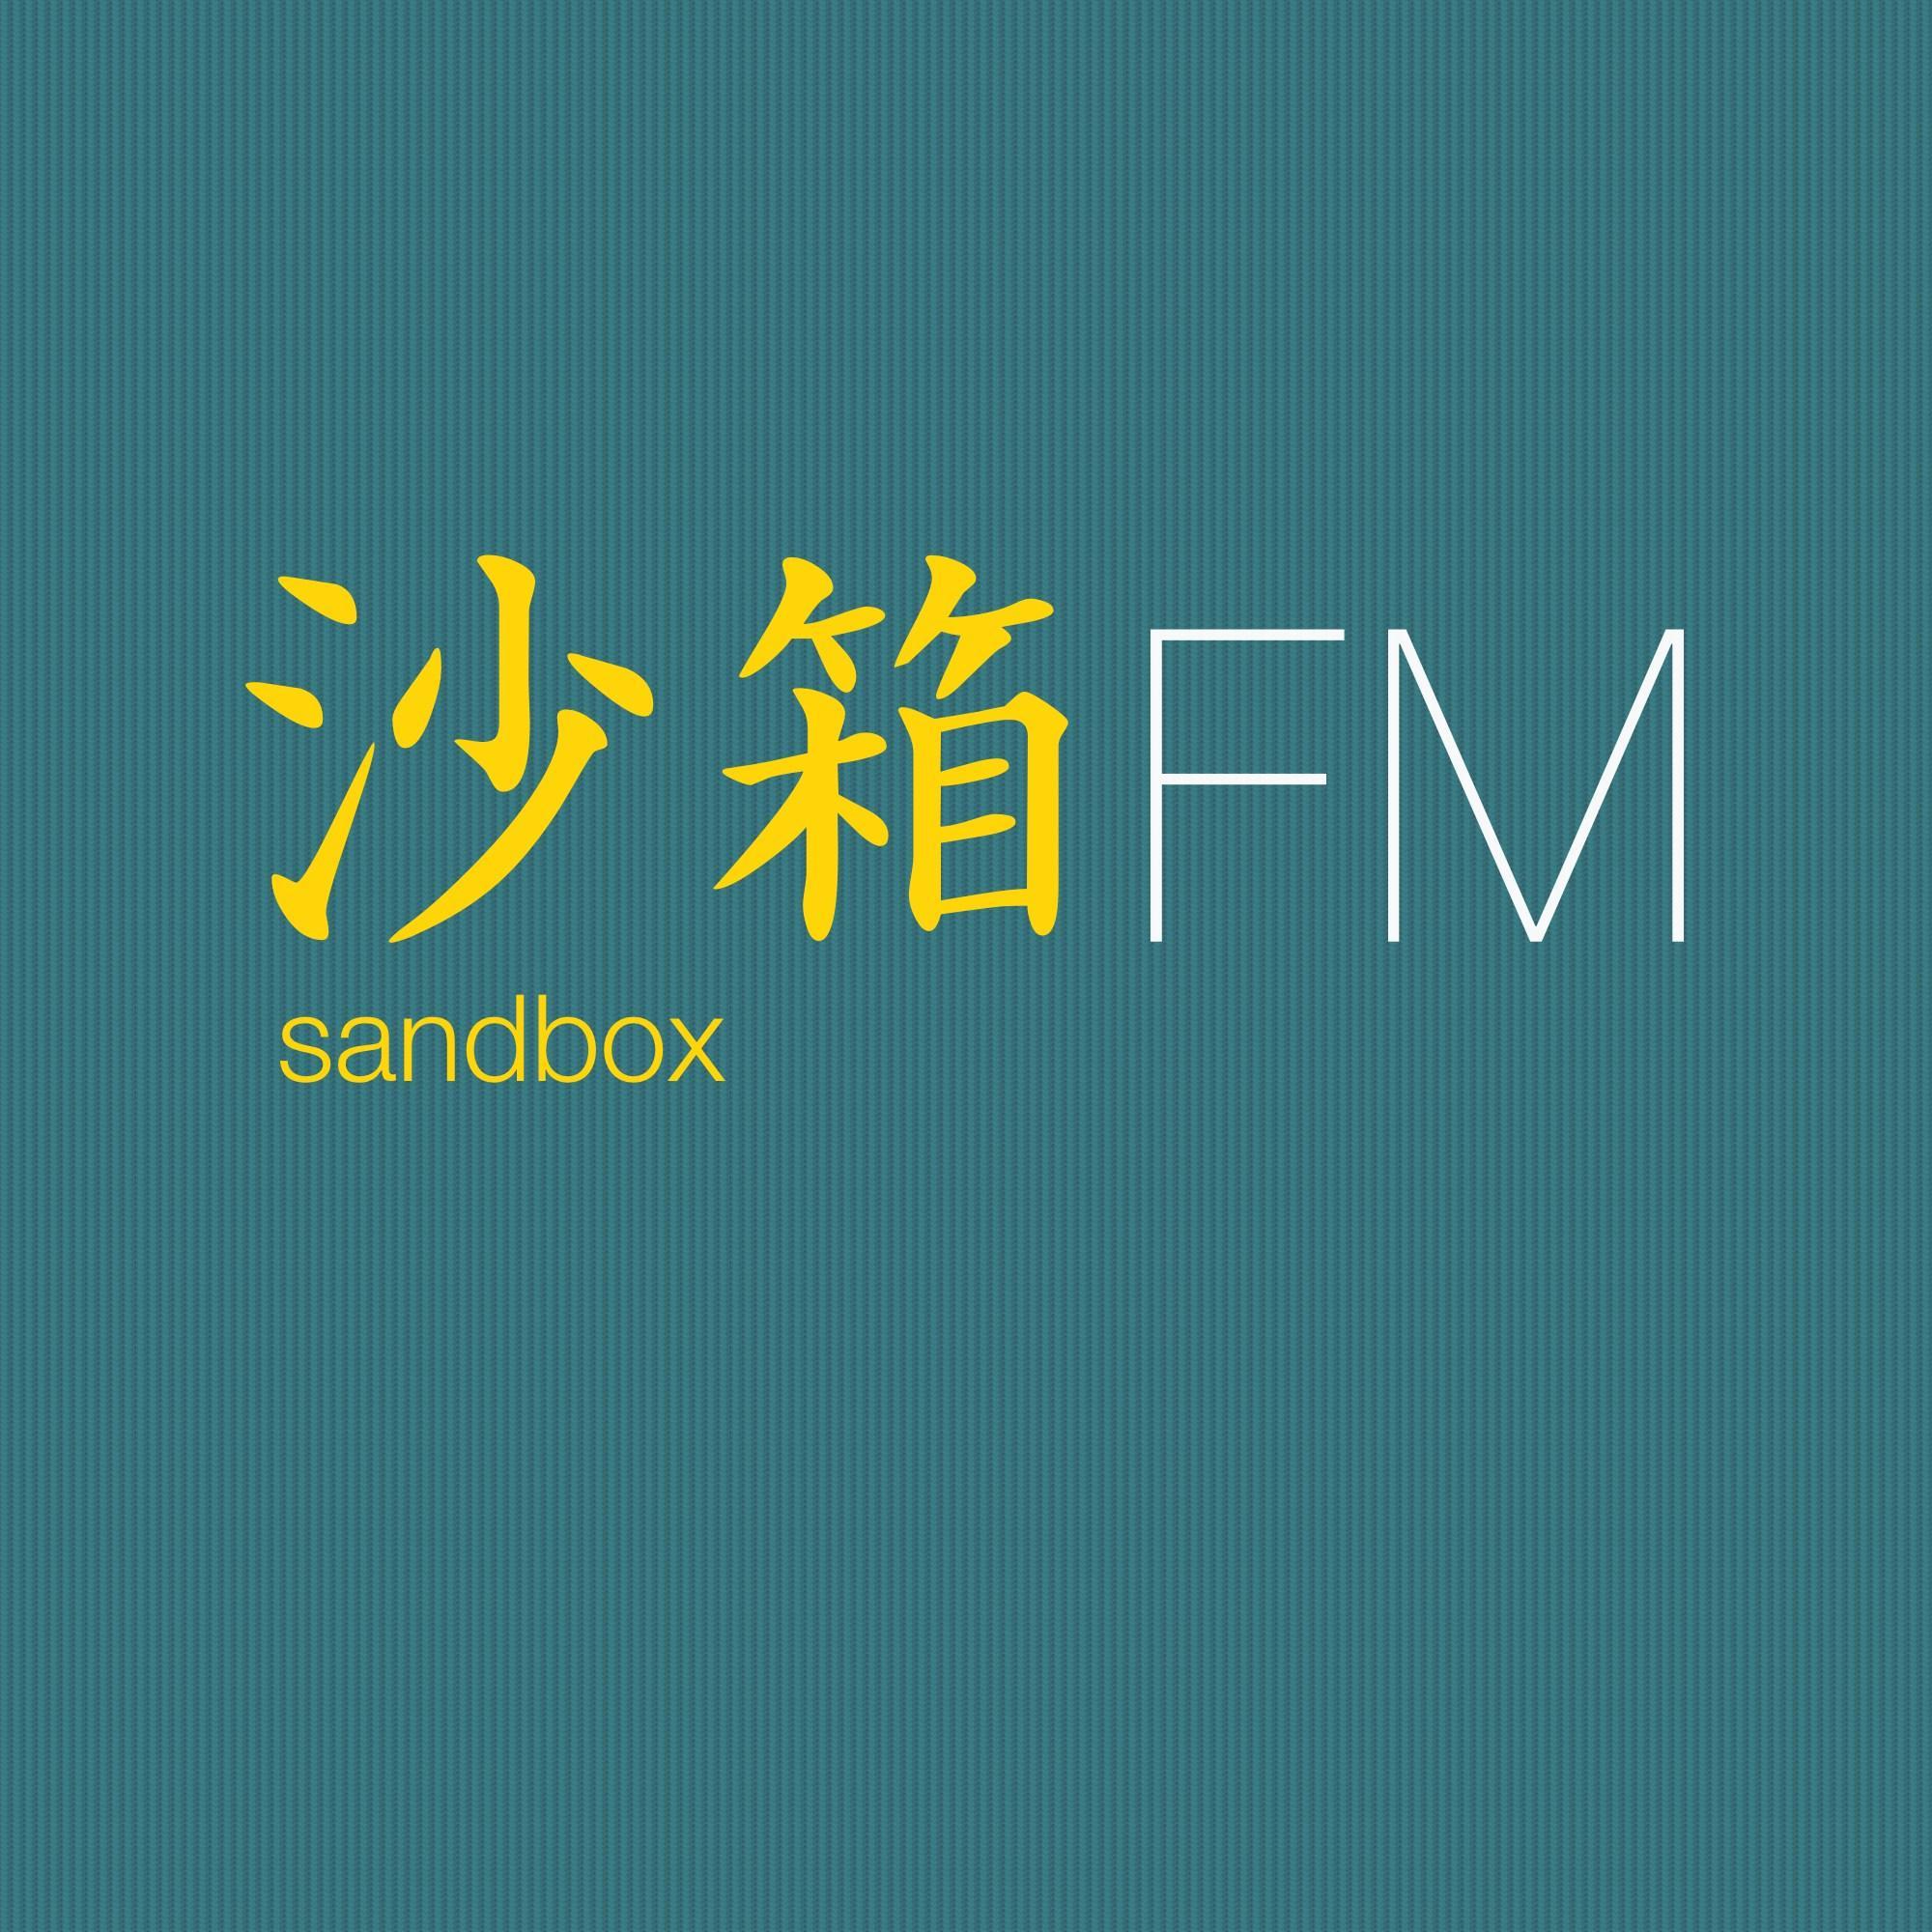 <![CDATA[沙箱FM]]>